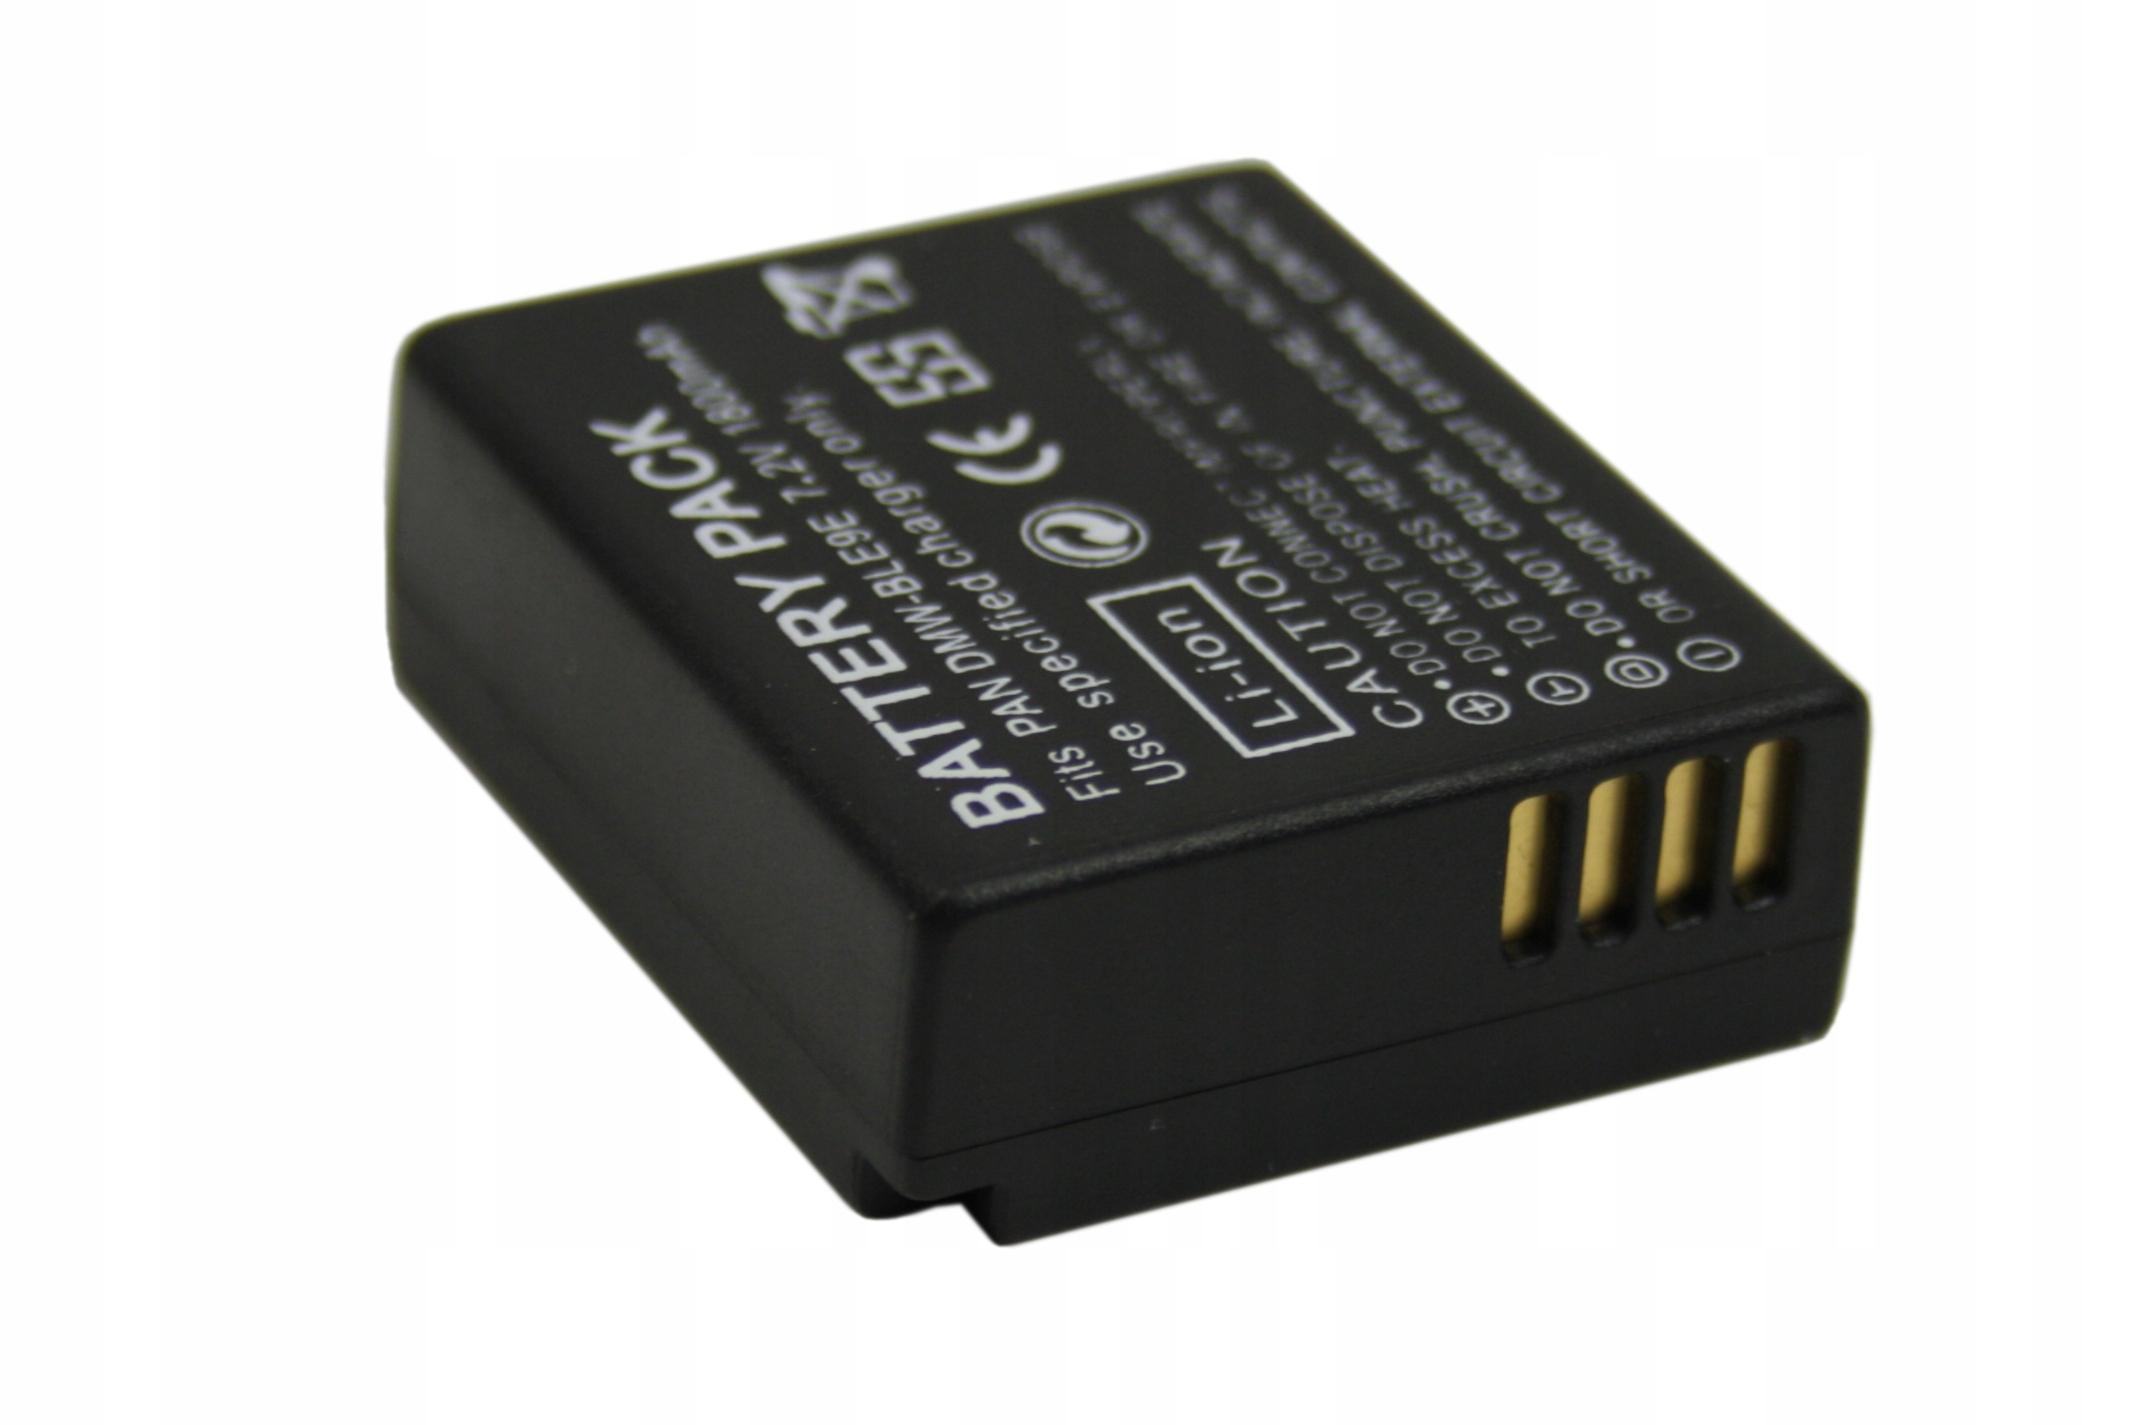 BATERIA AKUMULATOR PANASONIC DMW-BLG10 DMWBLG10 DMW BLG10E - Baterie do aparatów cyfrowych